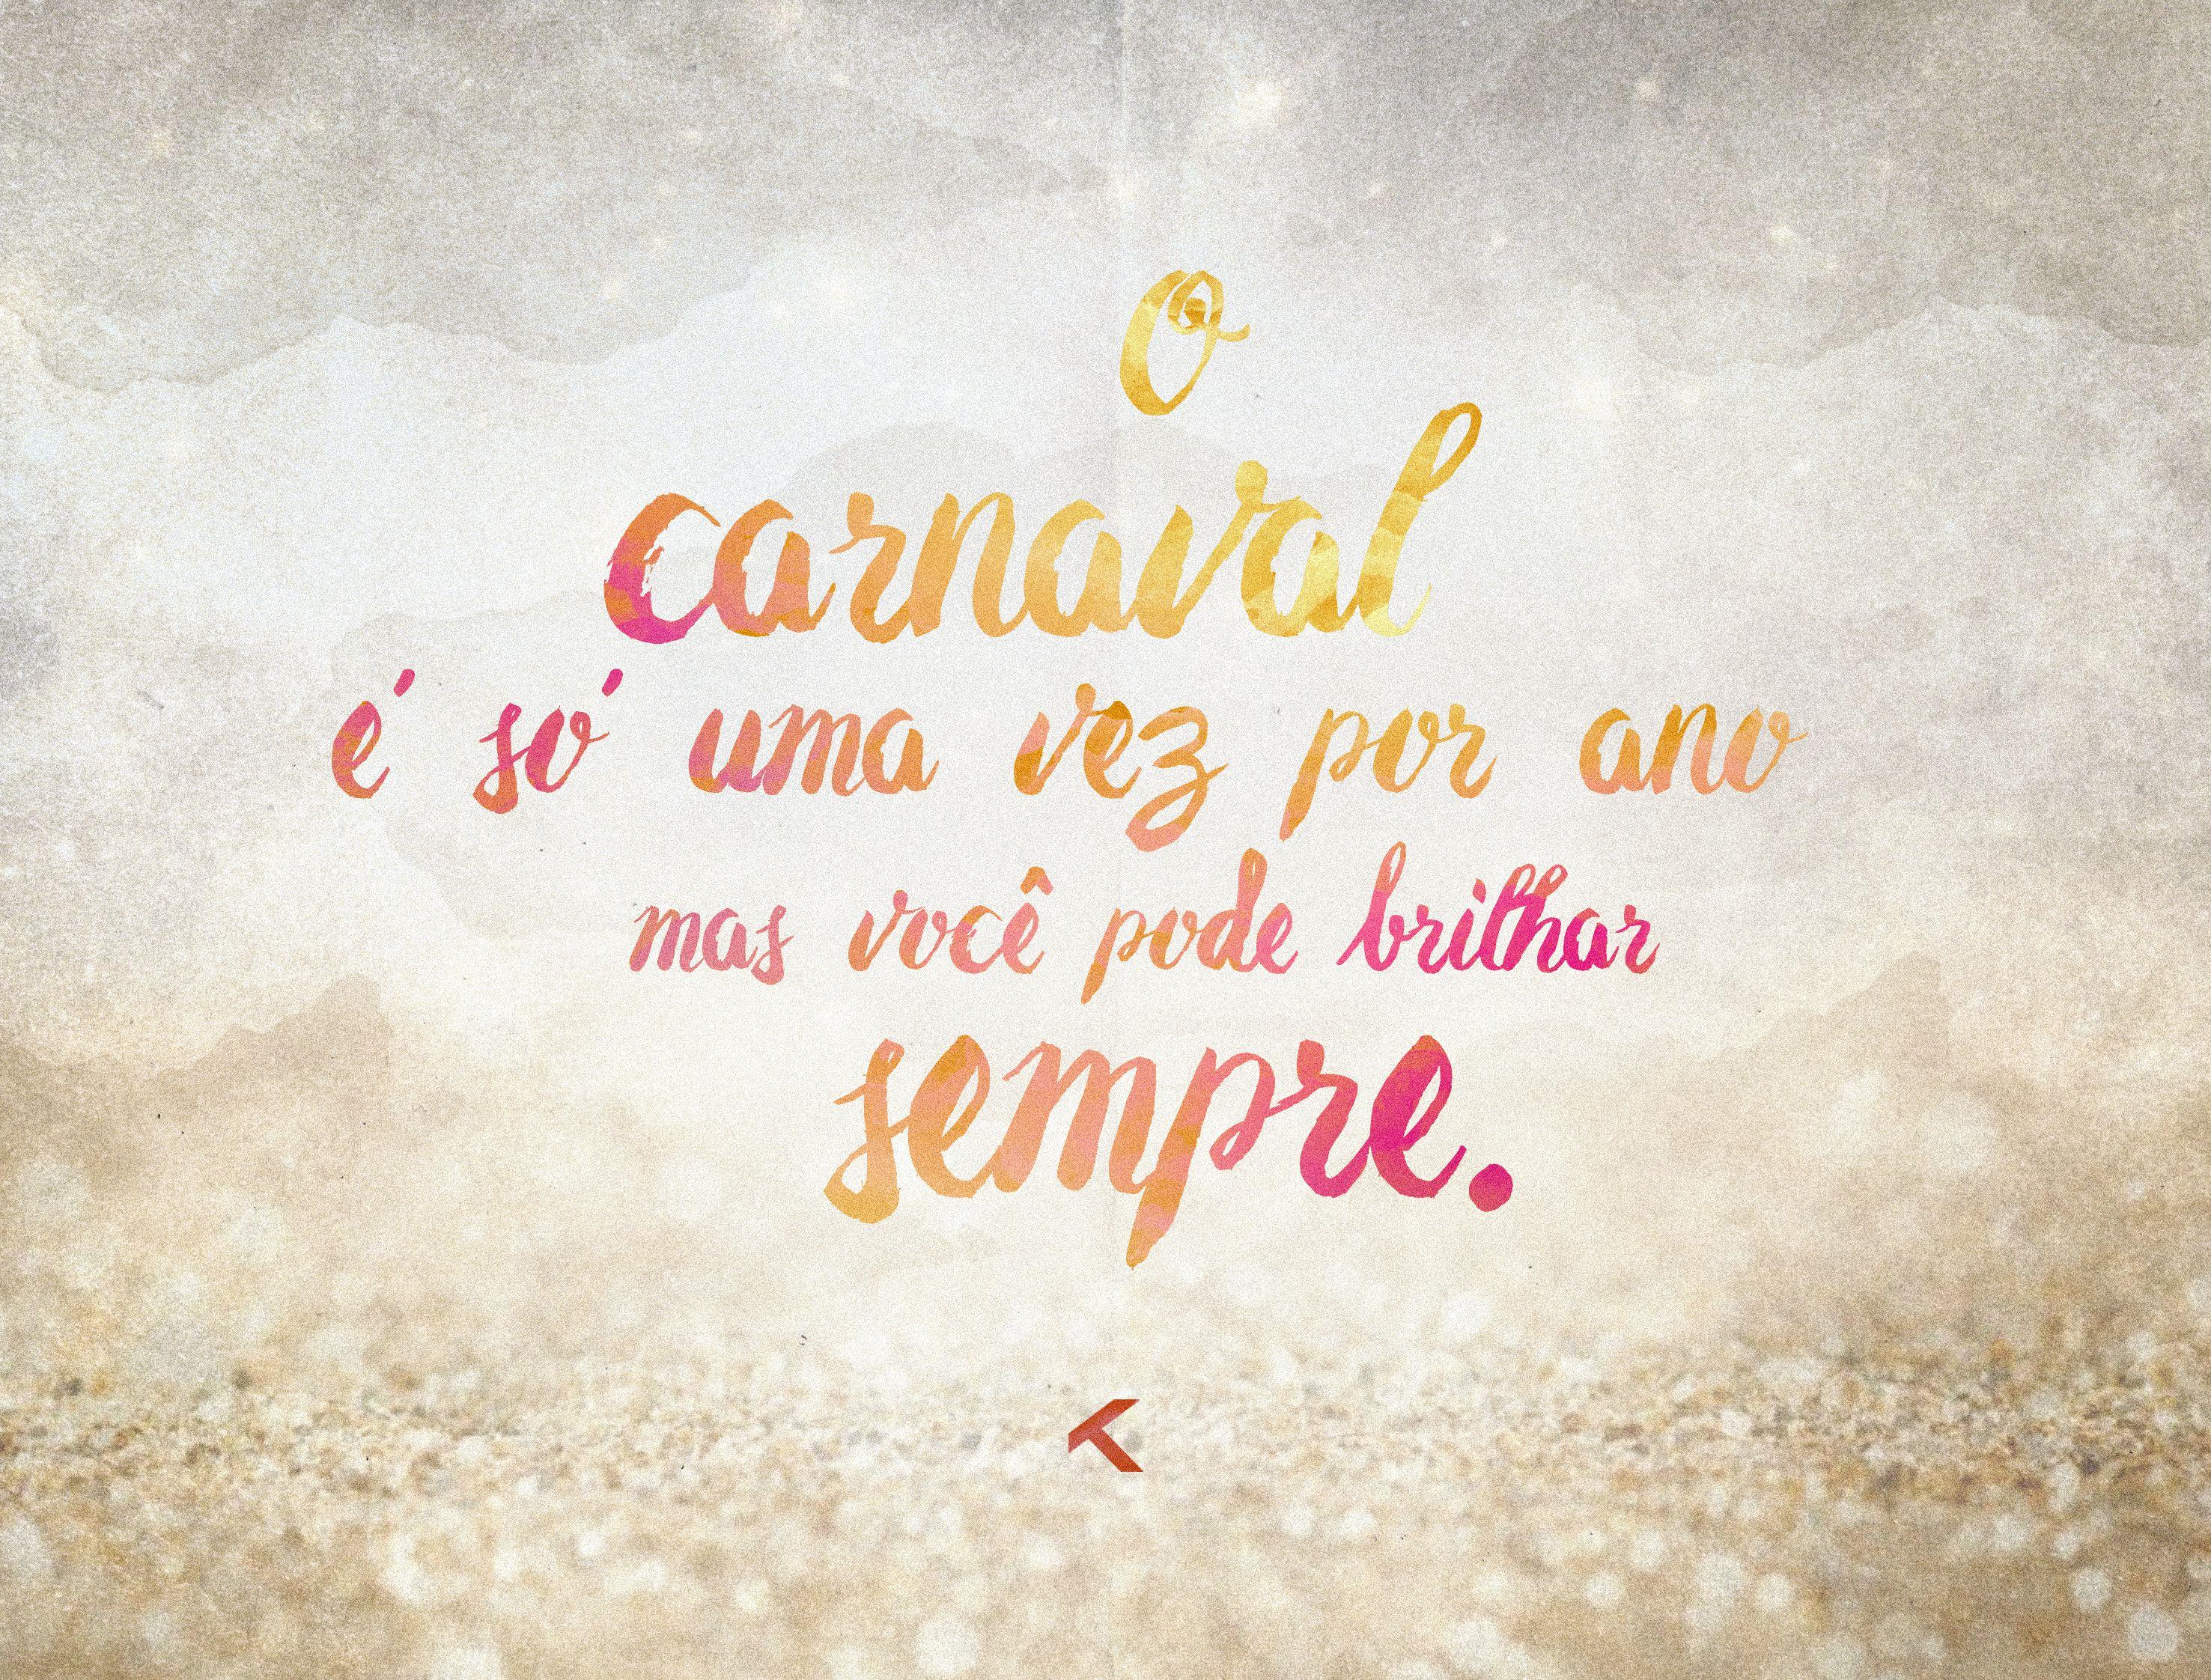 Frases Carnaval Frase Carnaval Carnaval E Frases